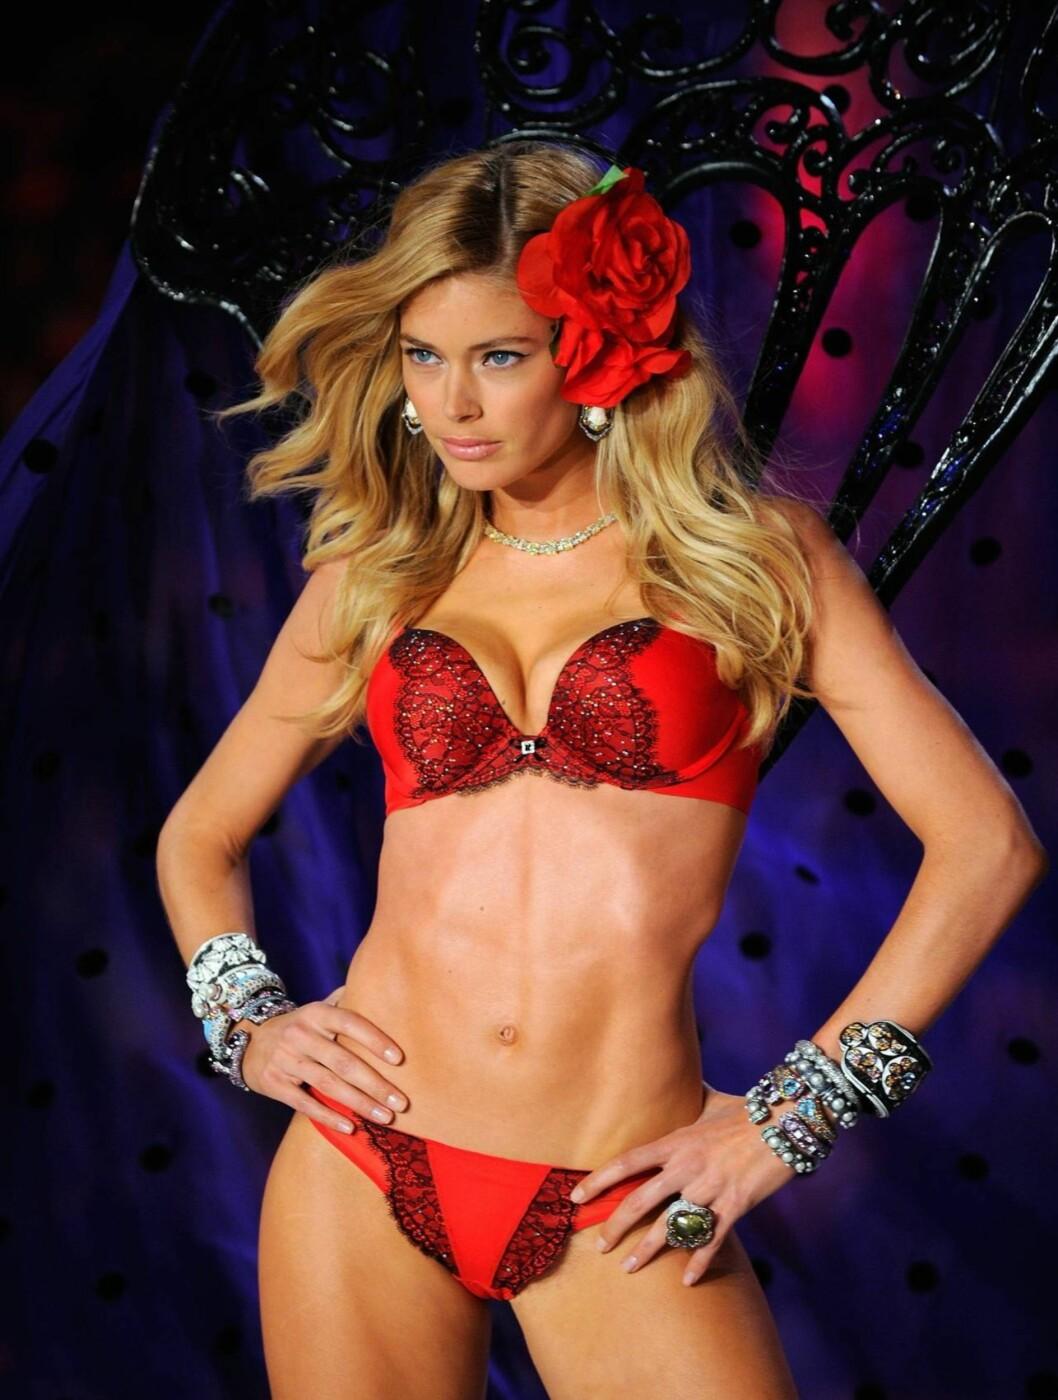 LADY IN RED: Doutzen Kroes viser fram julegavetips fra Victoria's Secret. Foto: All Over Press